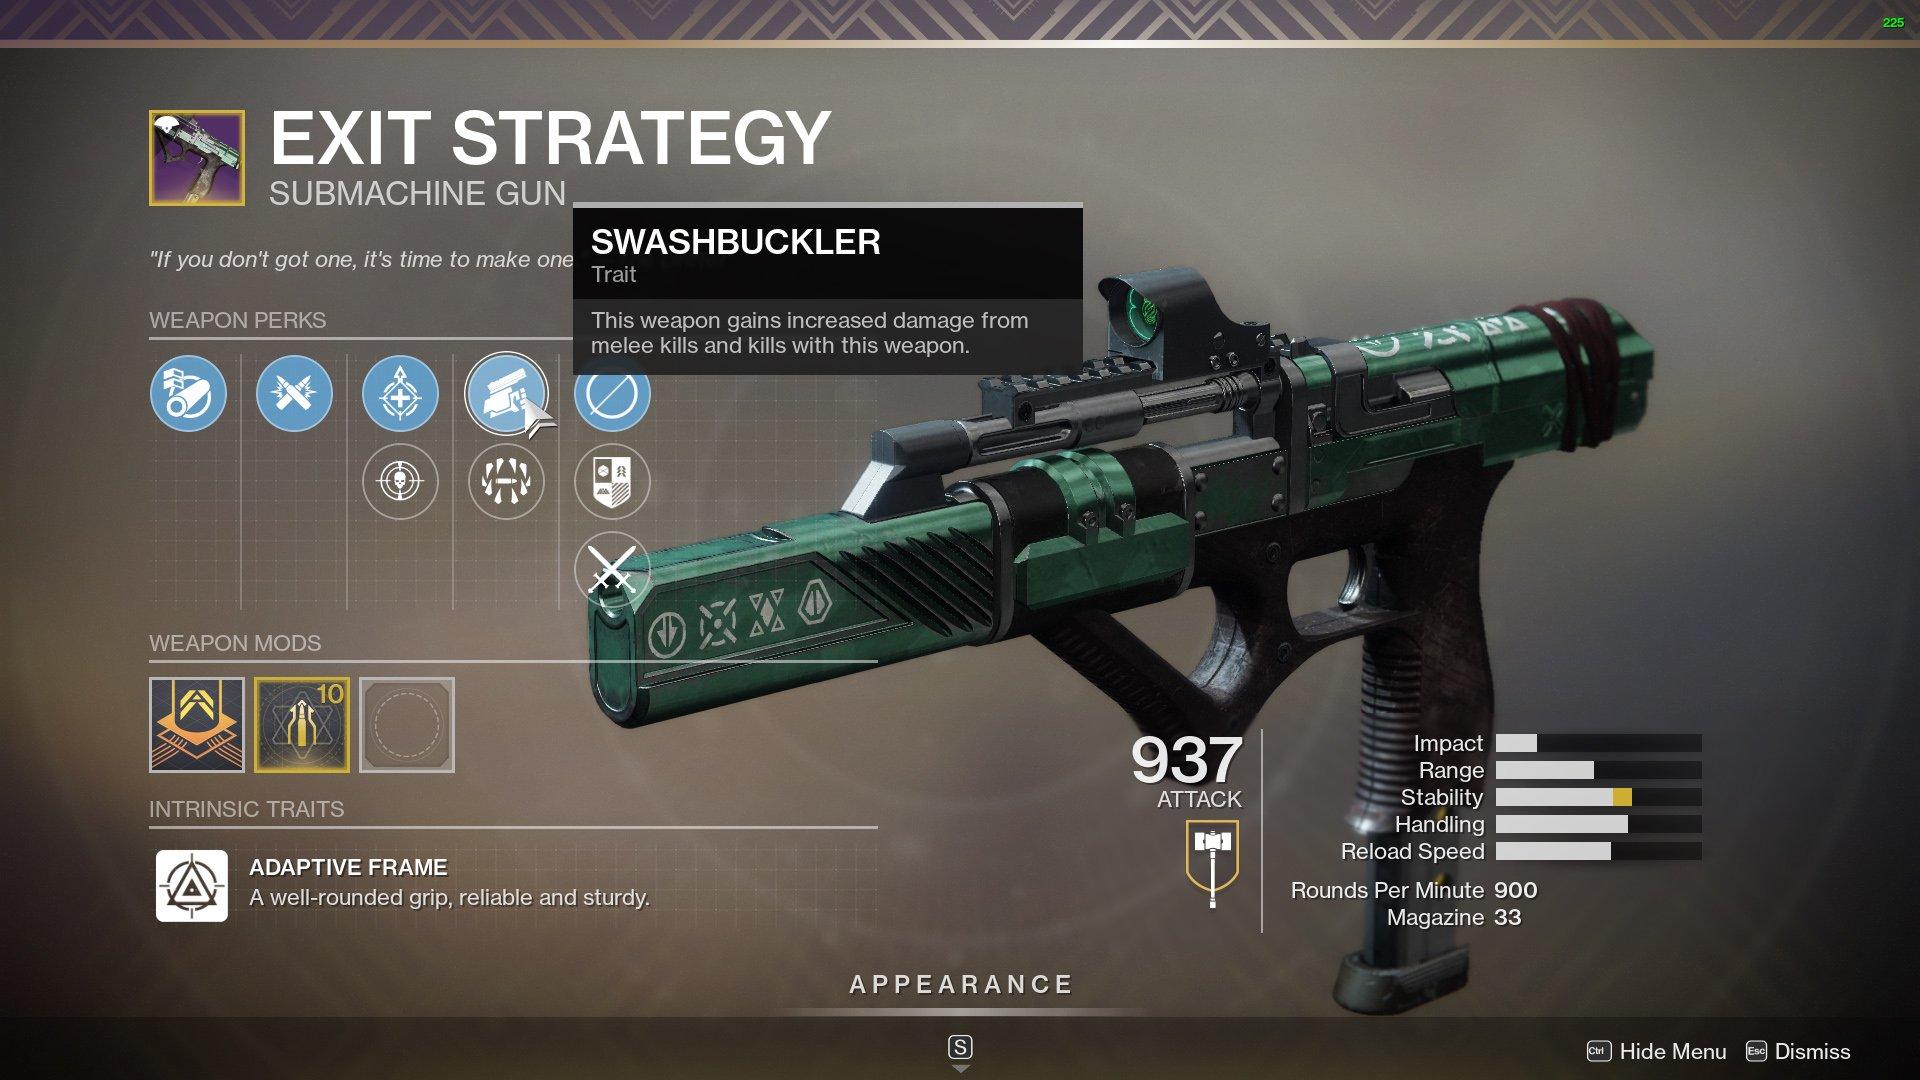 destiny 2 best smg exit strategy